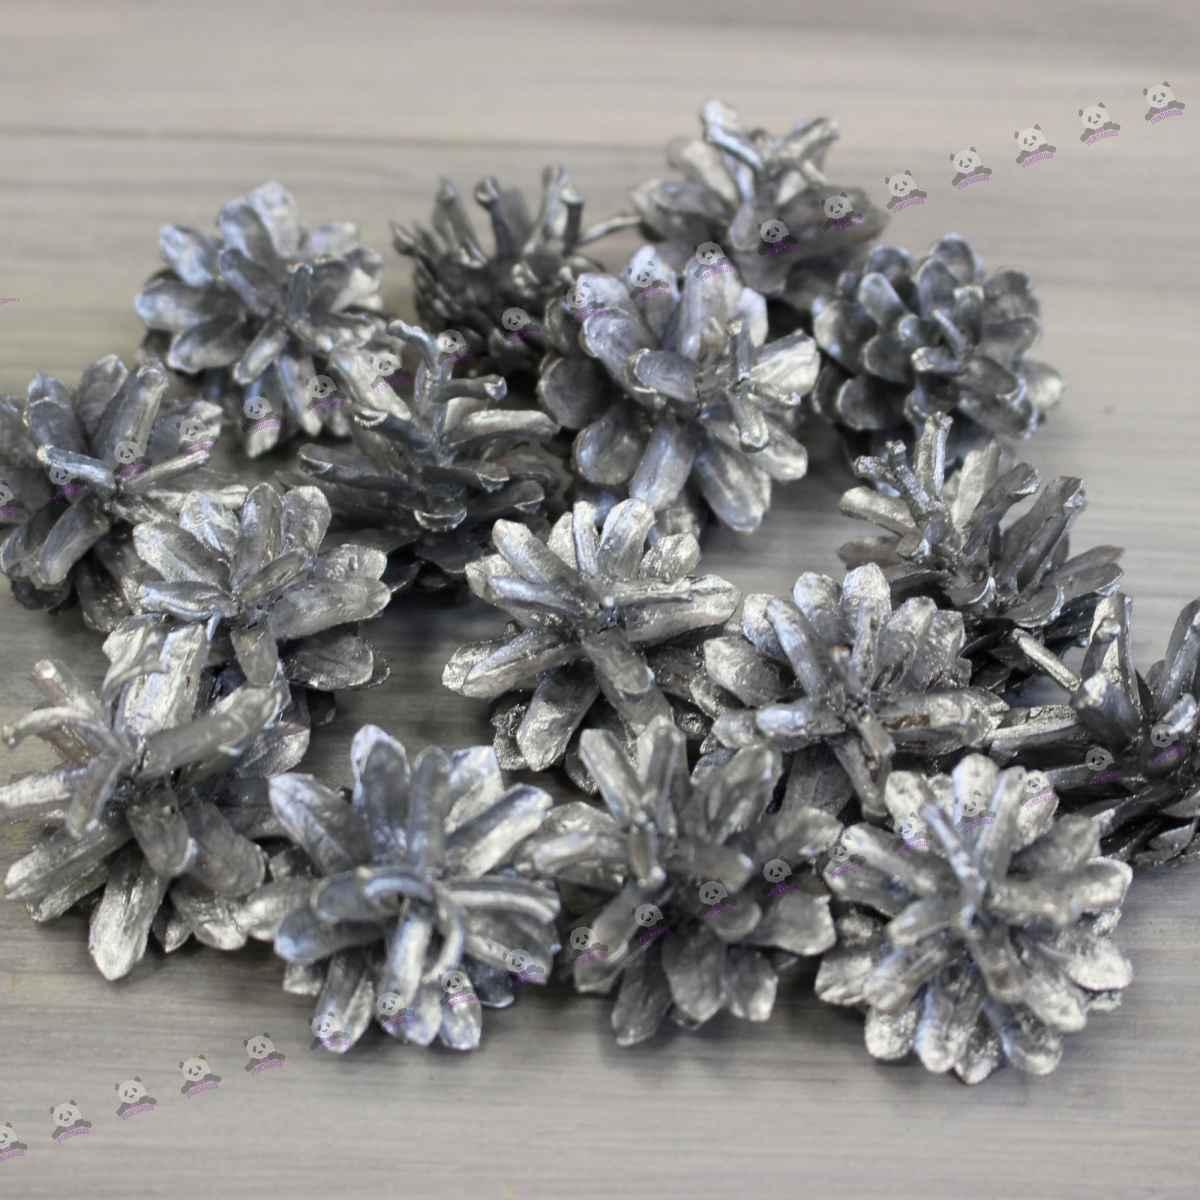 Сосновые шишки серебро